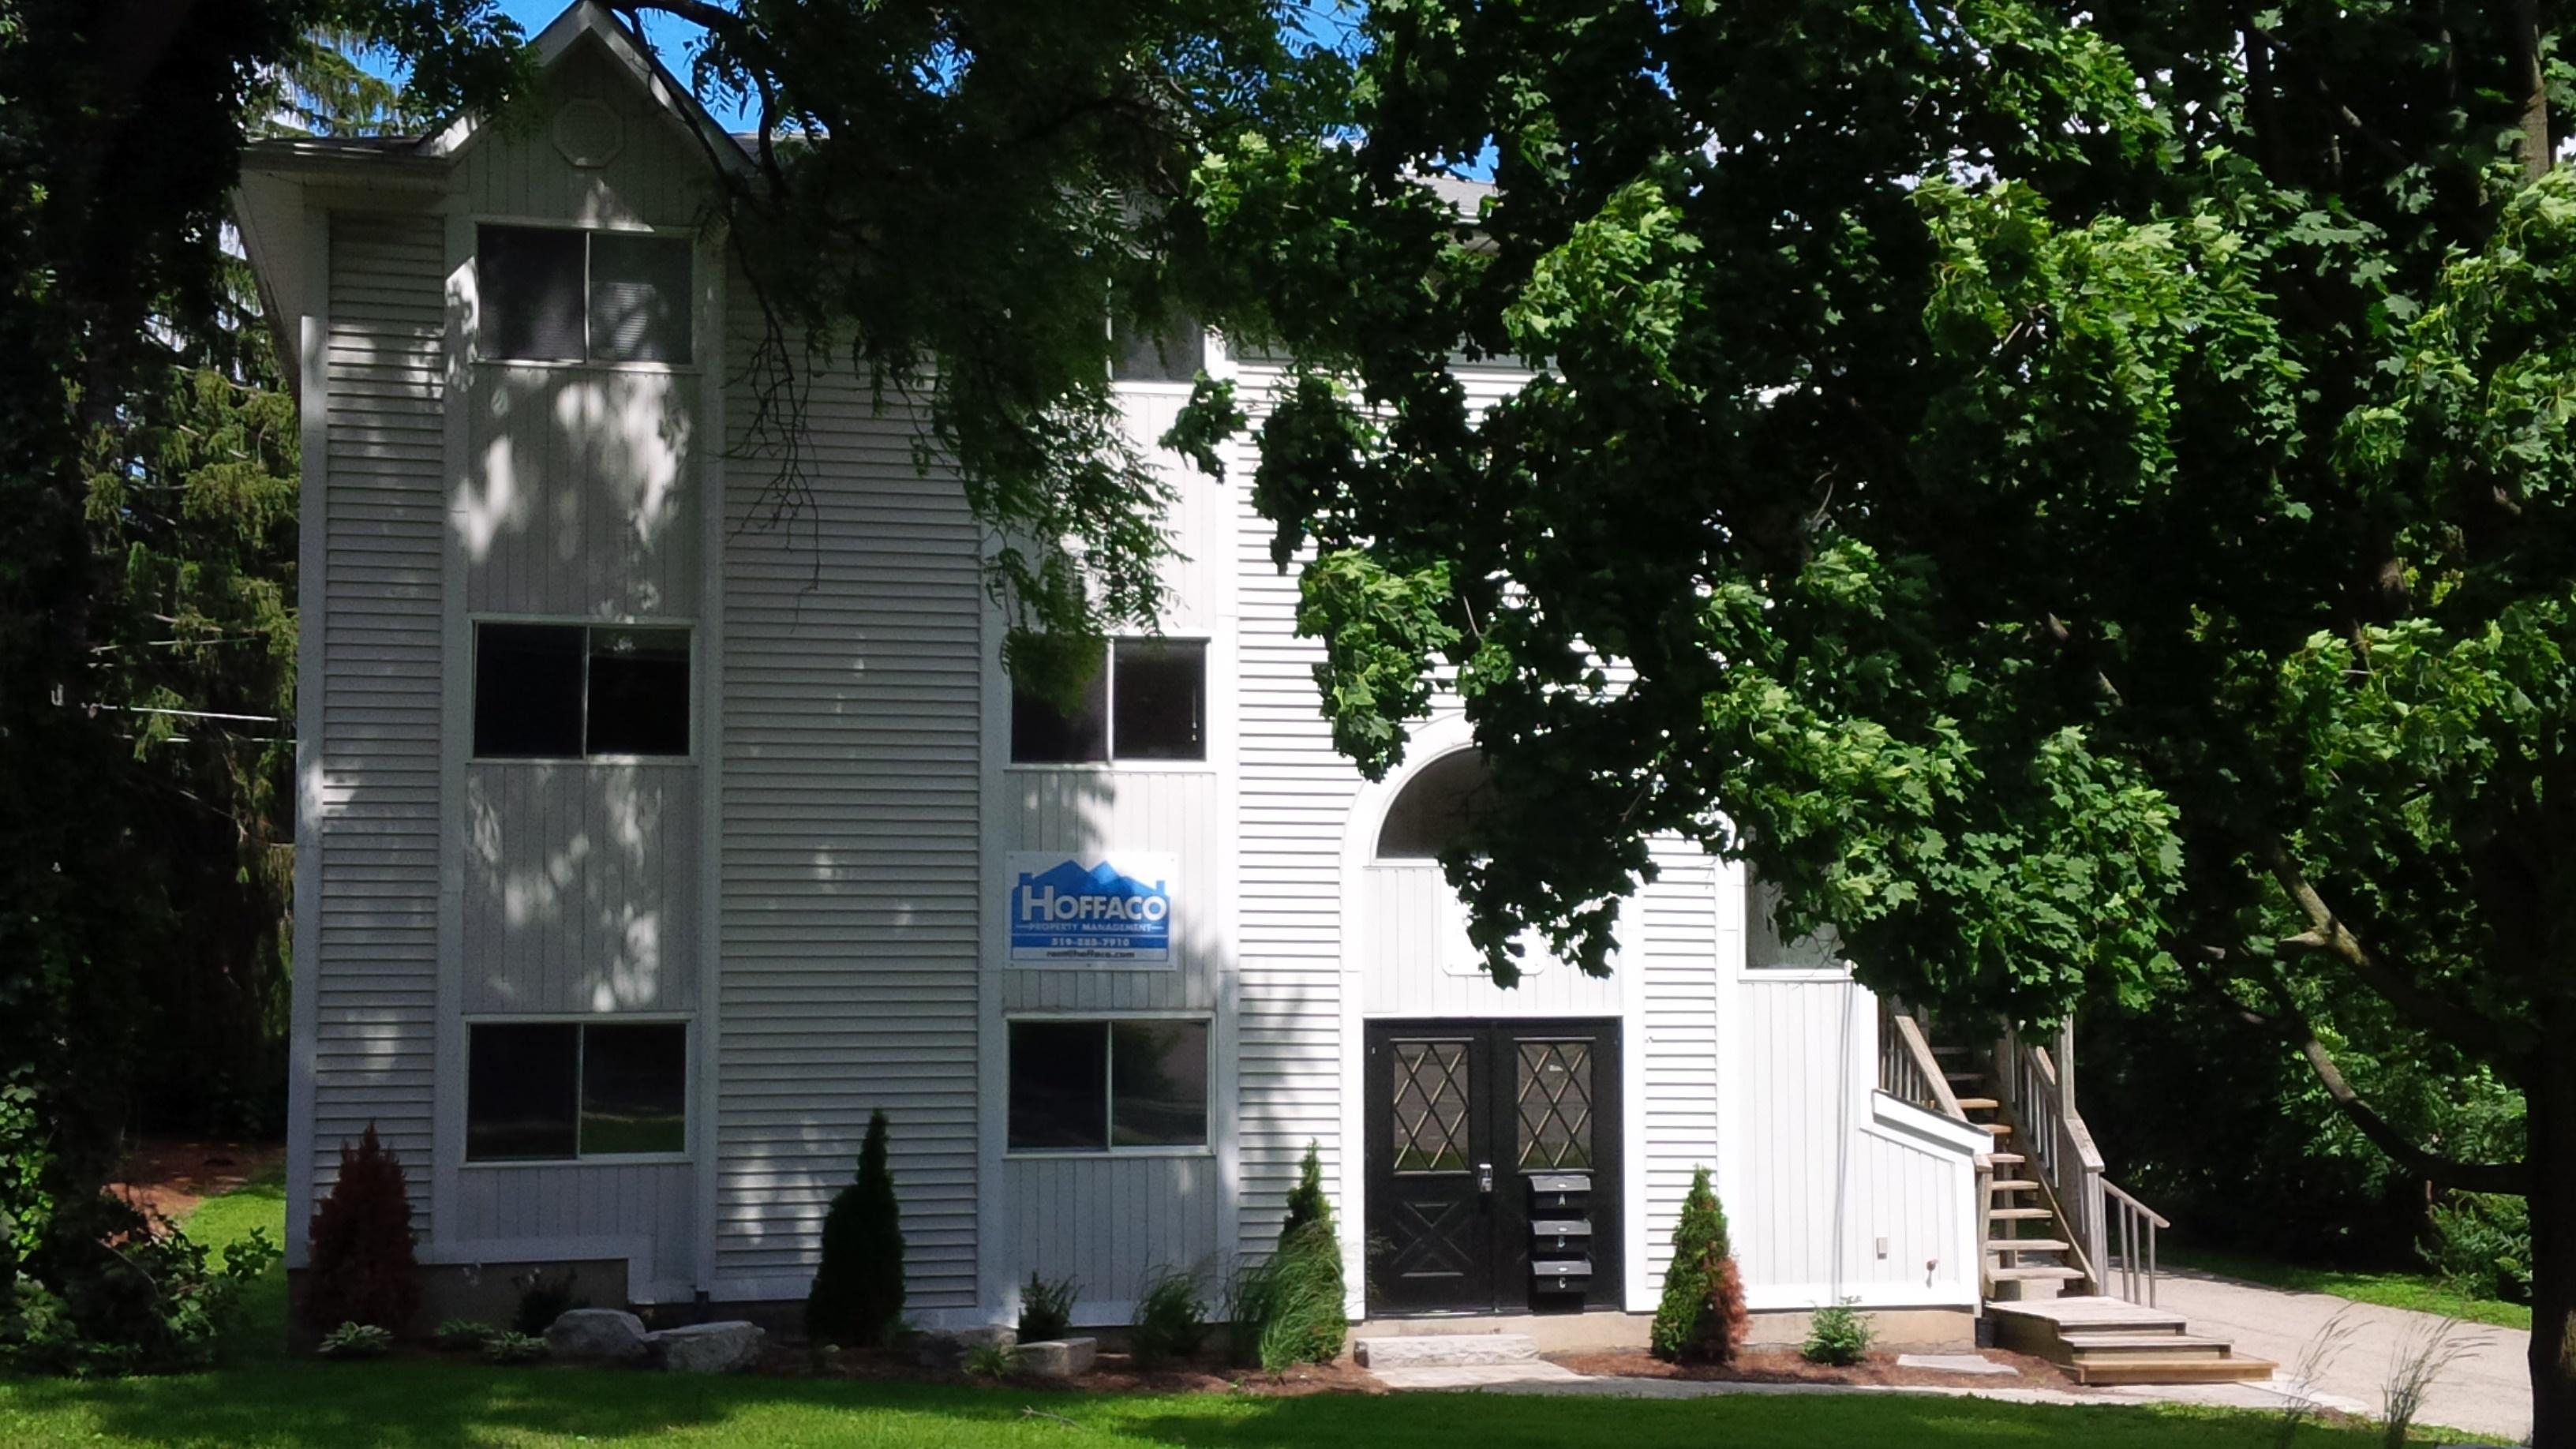 52 Noecker - STUDENTS!  Granite kitchen + FREE Utilities! Walk to WLU + Uptown! Furniture!